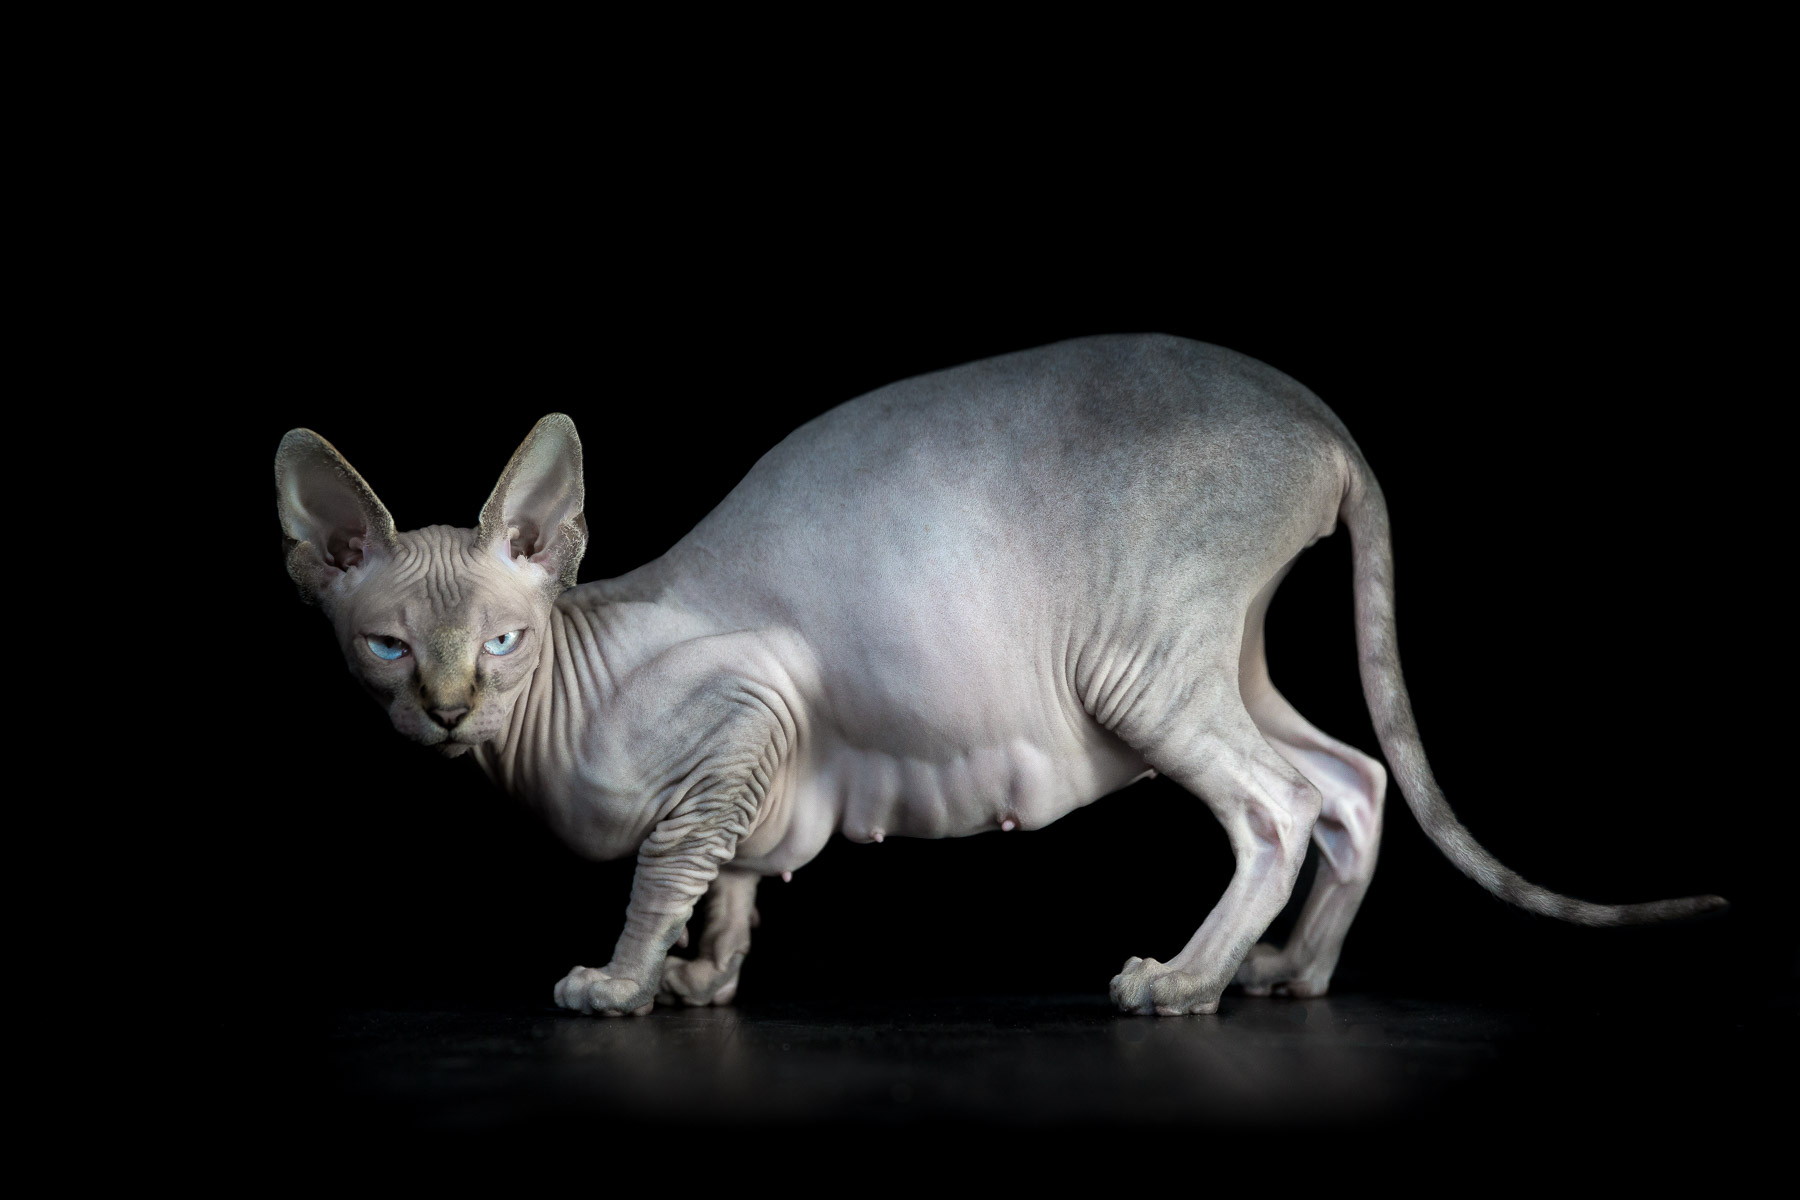 sphynx-cat-photos-by-alicia-rius-5.jpg